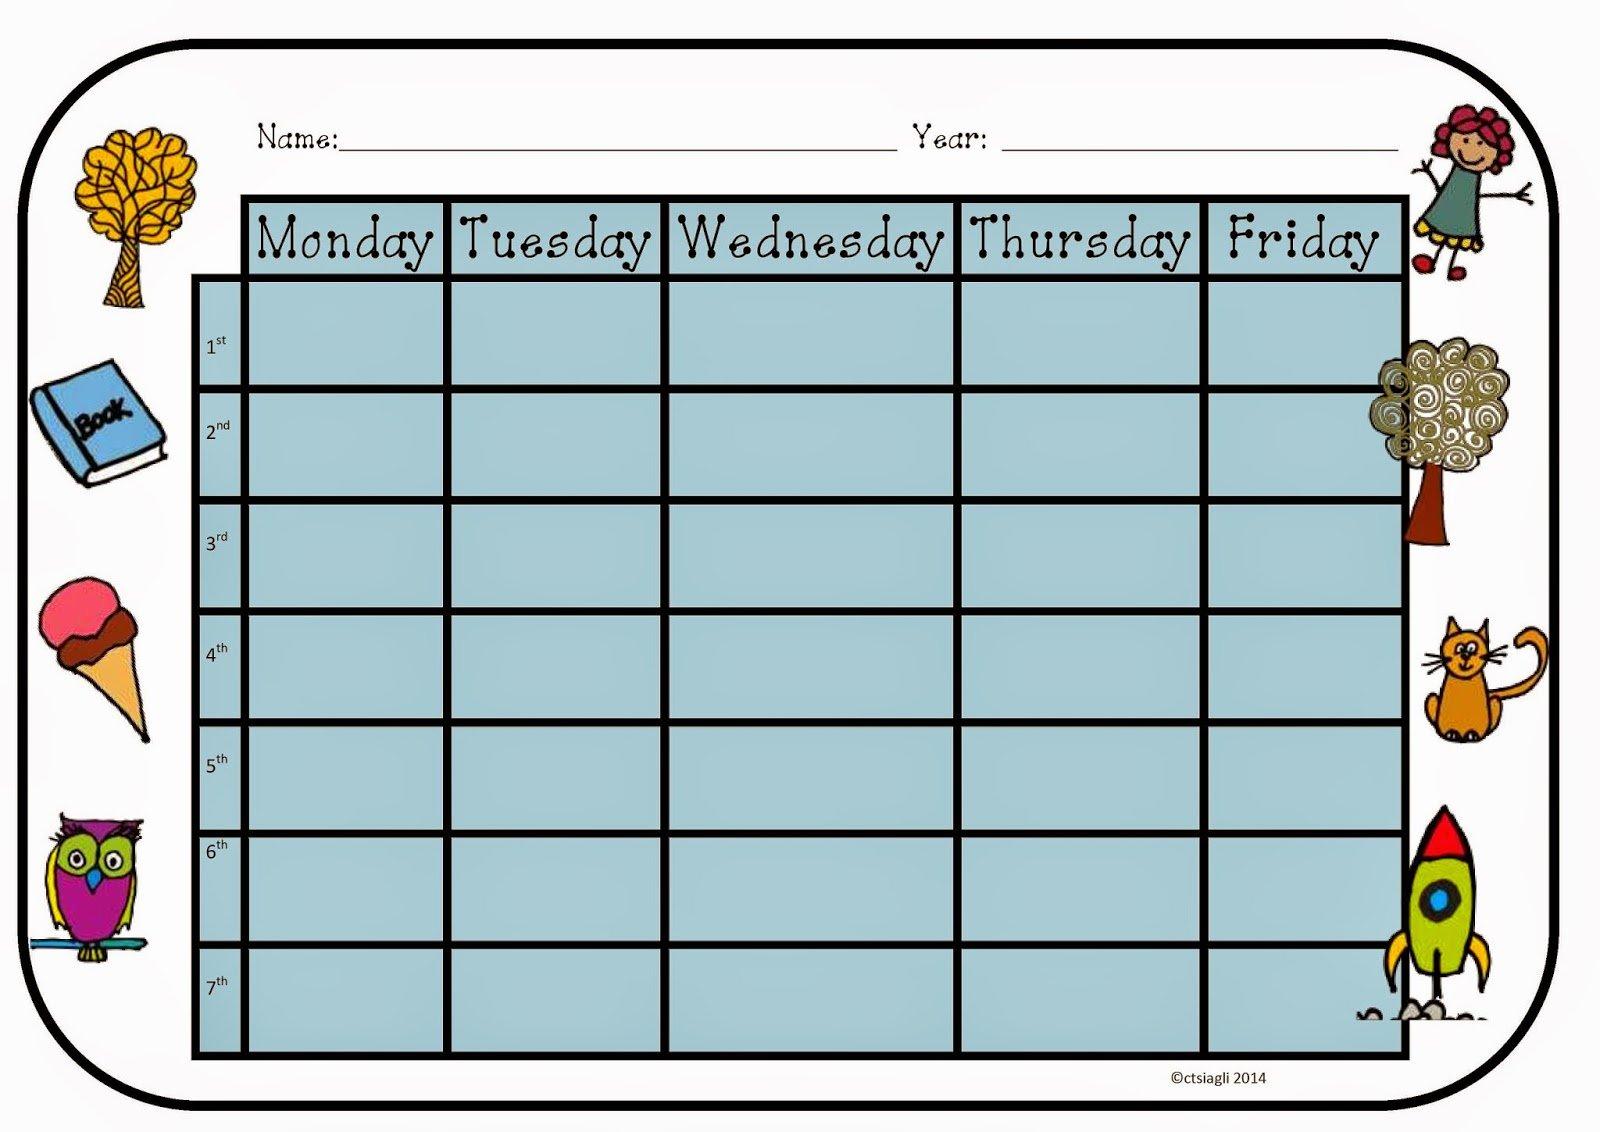 I,Teacher: Printable Weekly Timetables 8 Week Printable Timetable